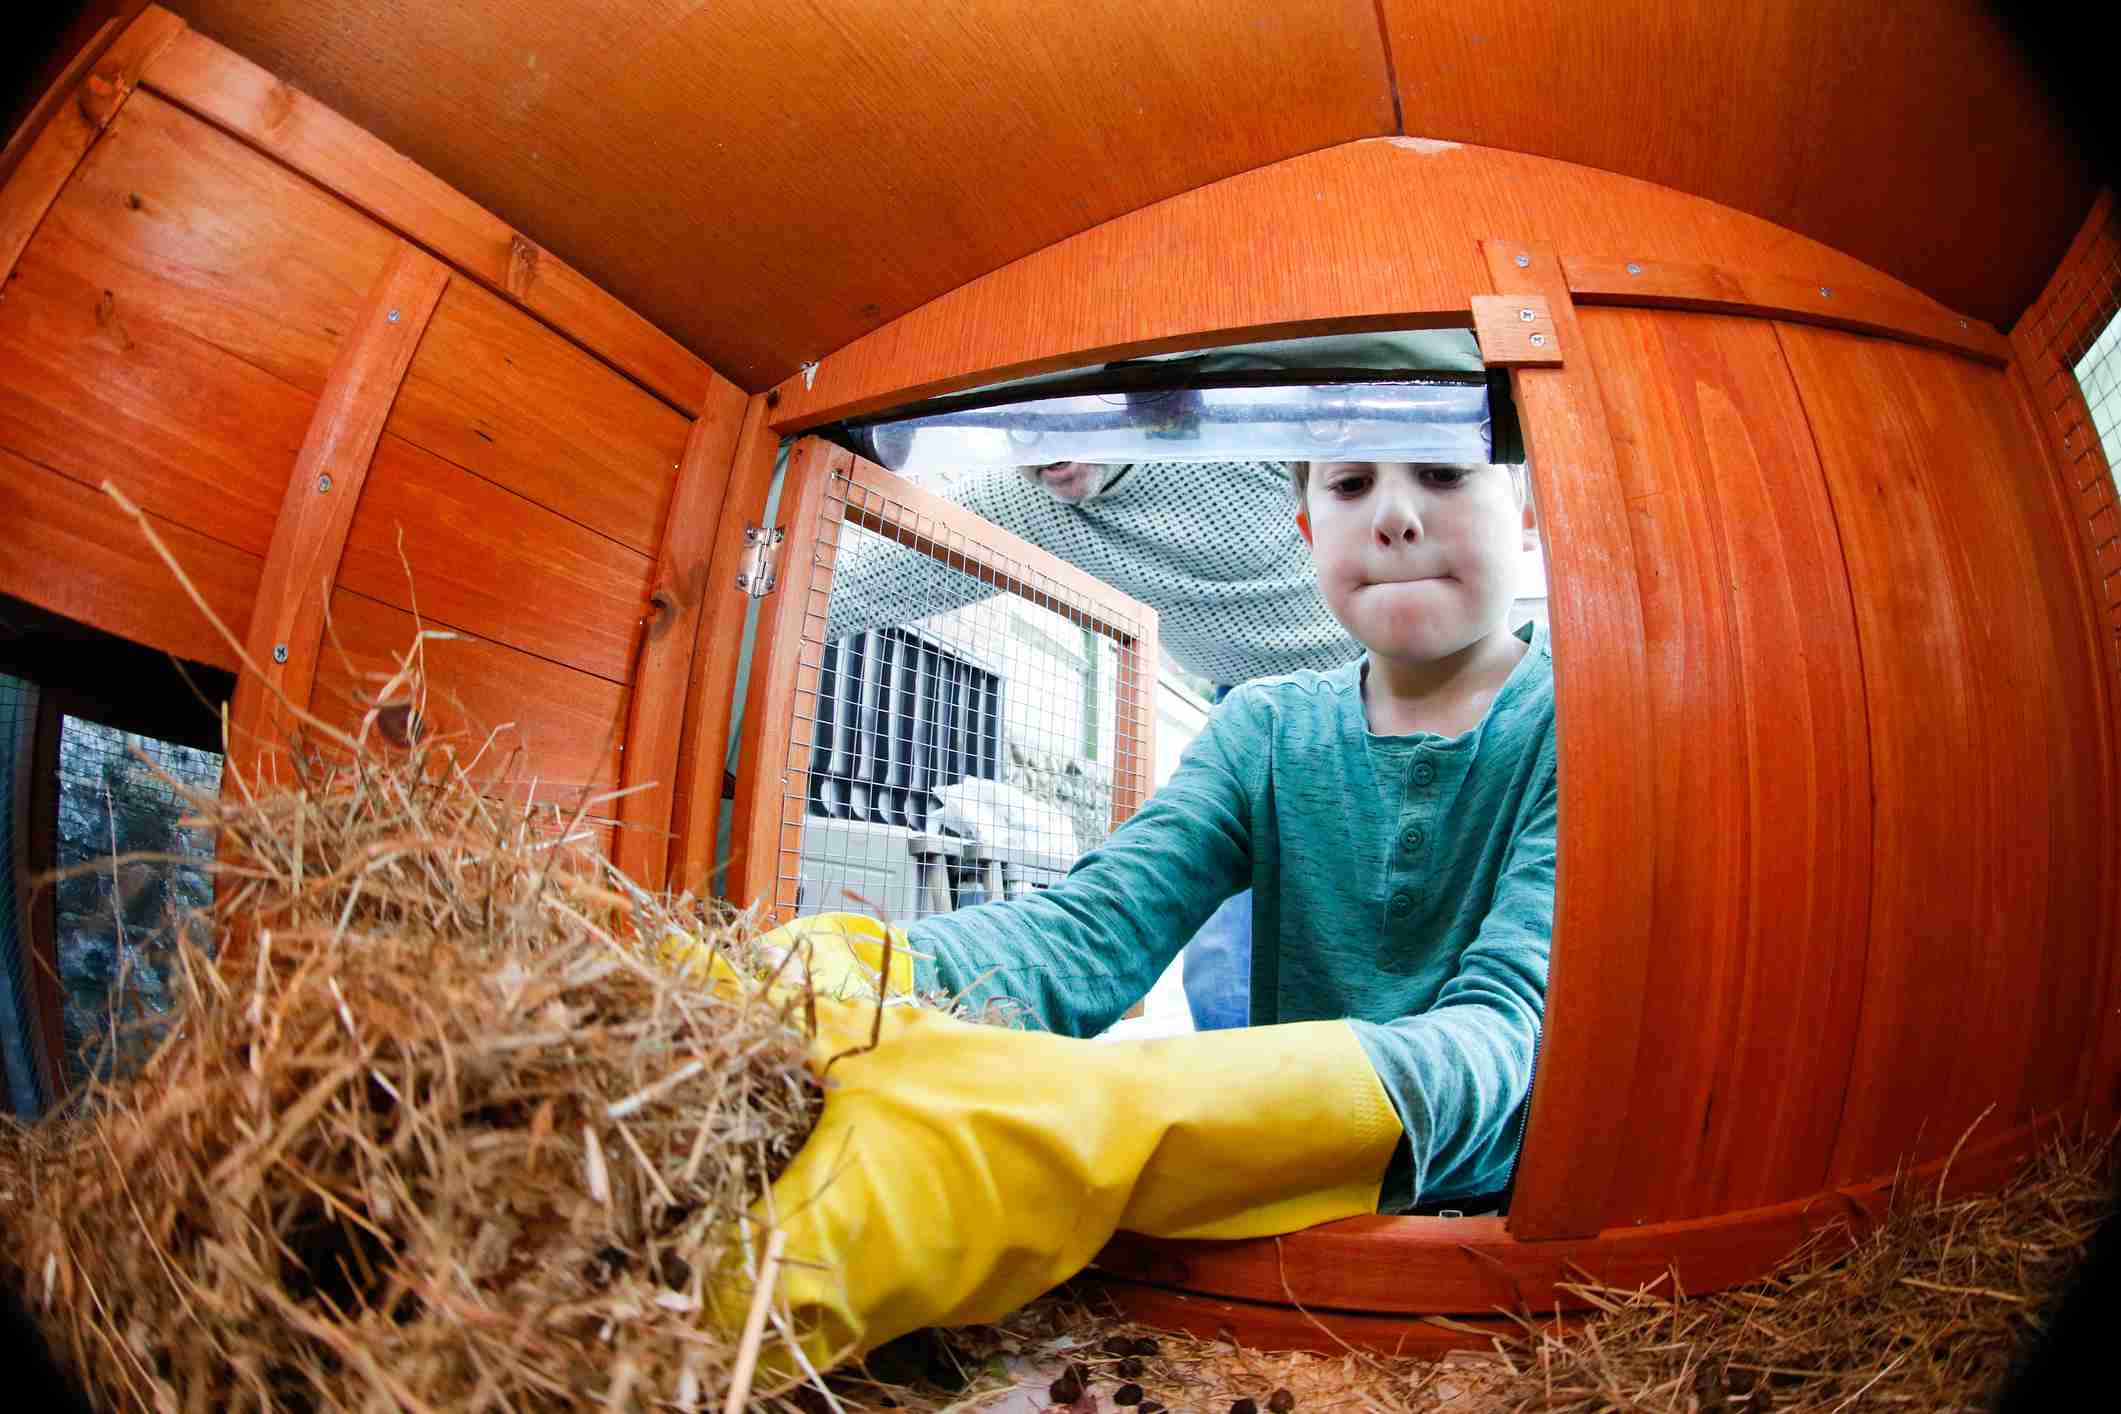 Boy cleaning rabbit hutch